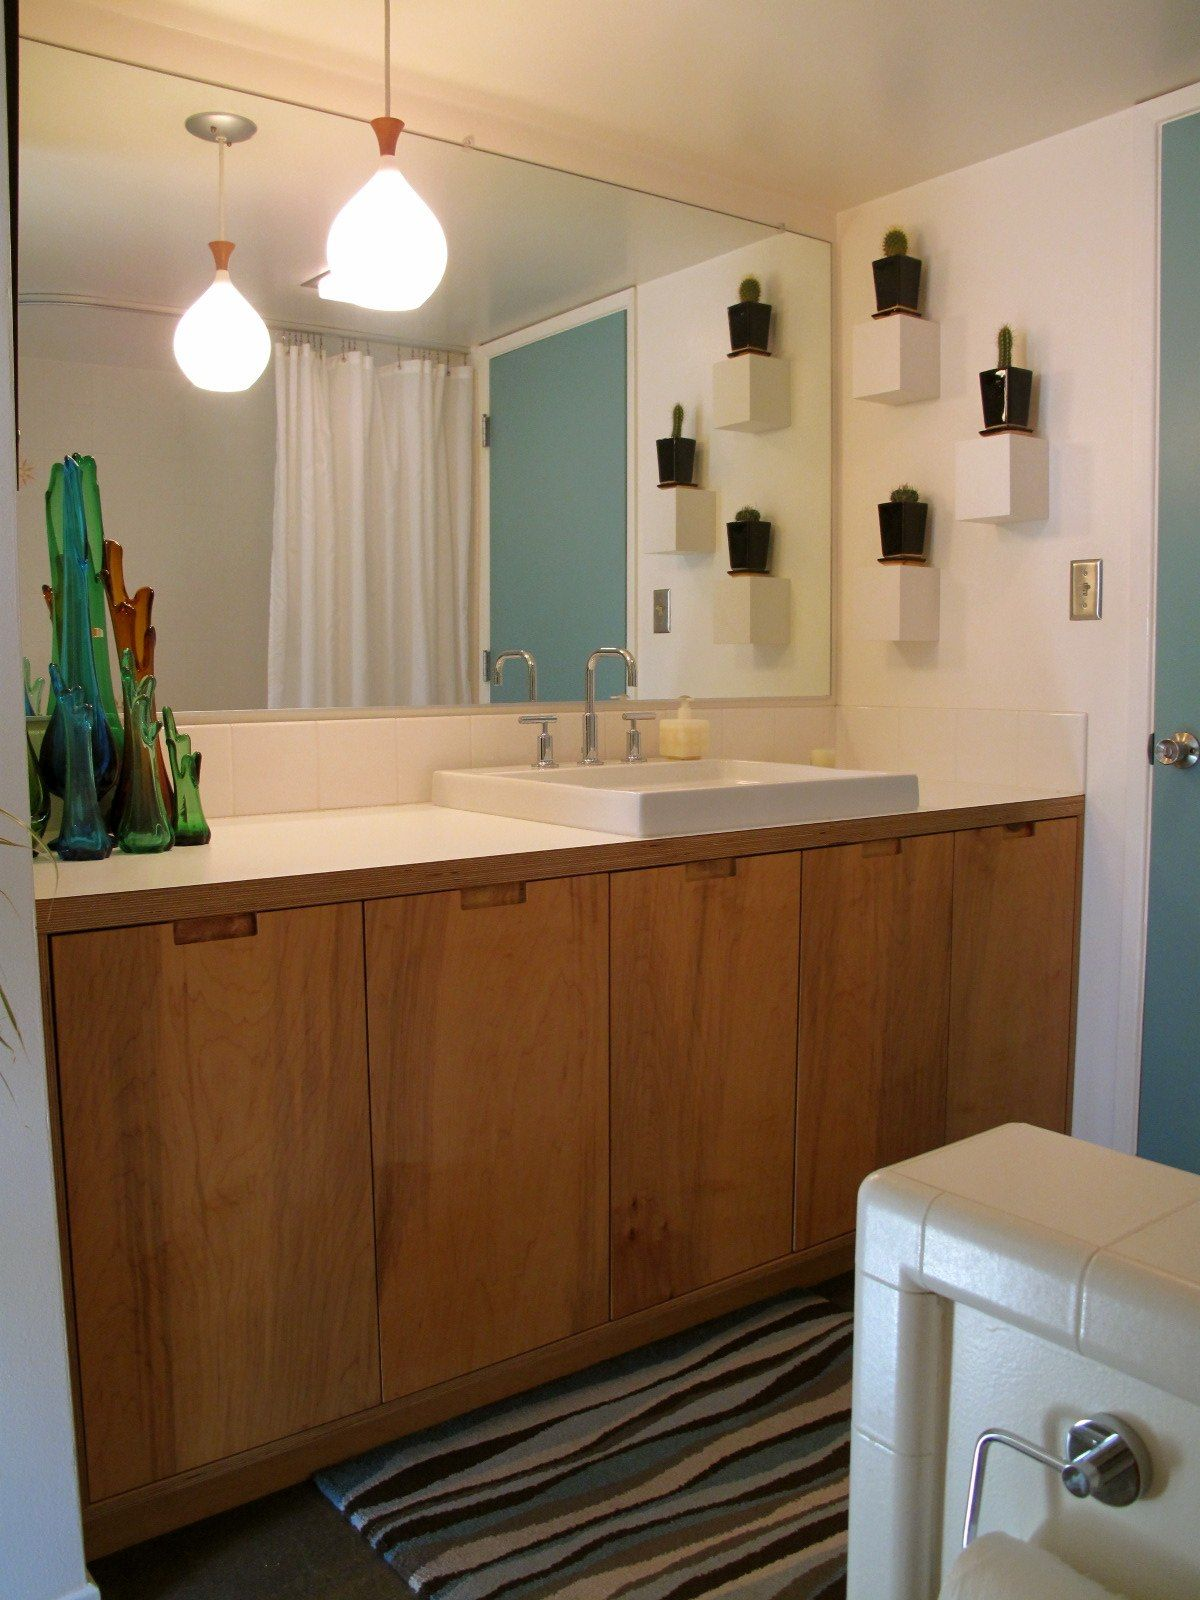 Mid Century Bathroom With Glass Vases